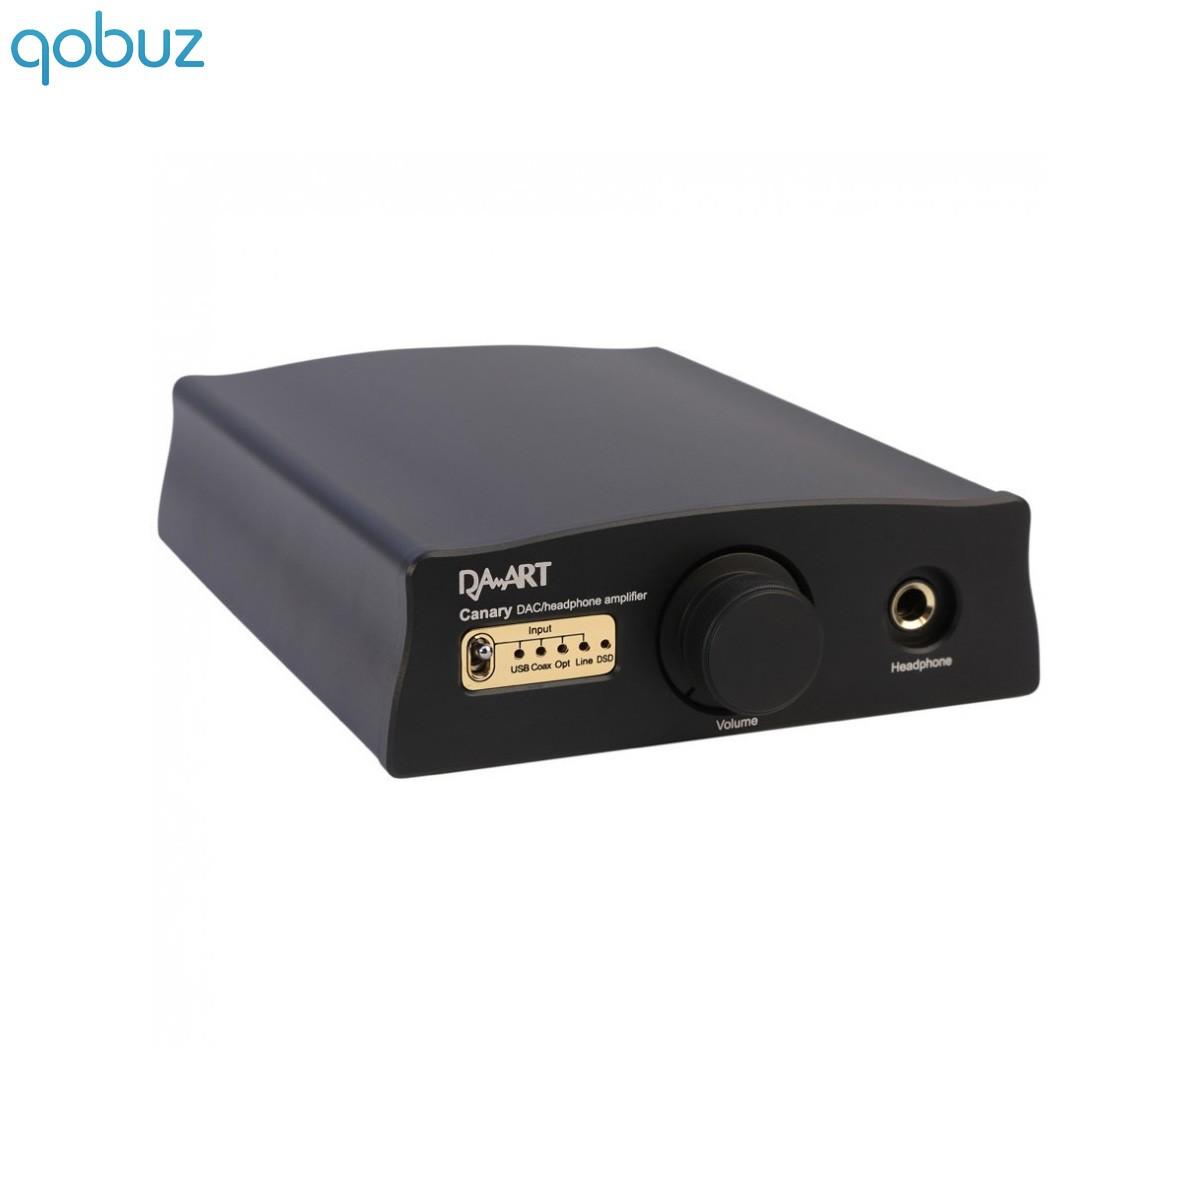 DAART Canary DAC USB XMOS DSD ES9018K2M 32Bit Headphone out class A Black